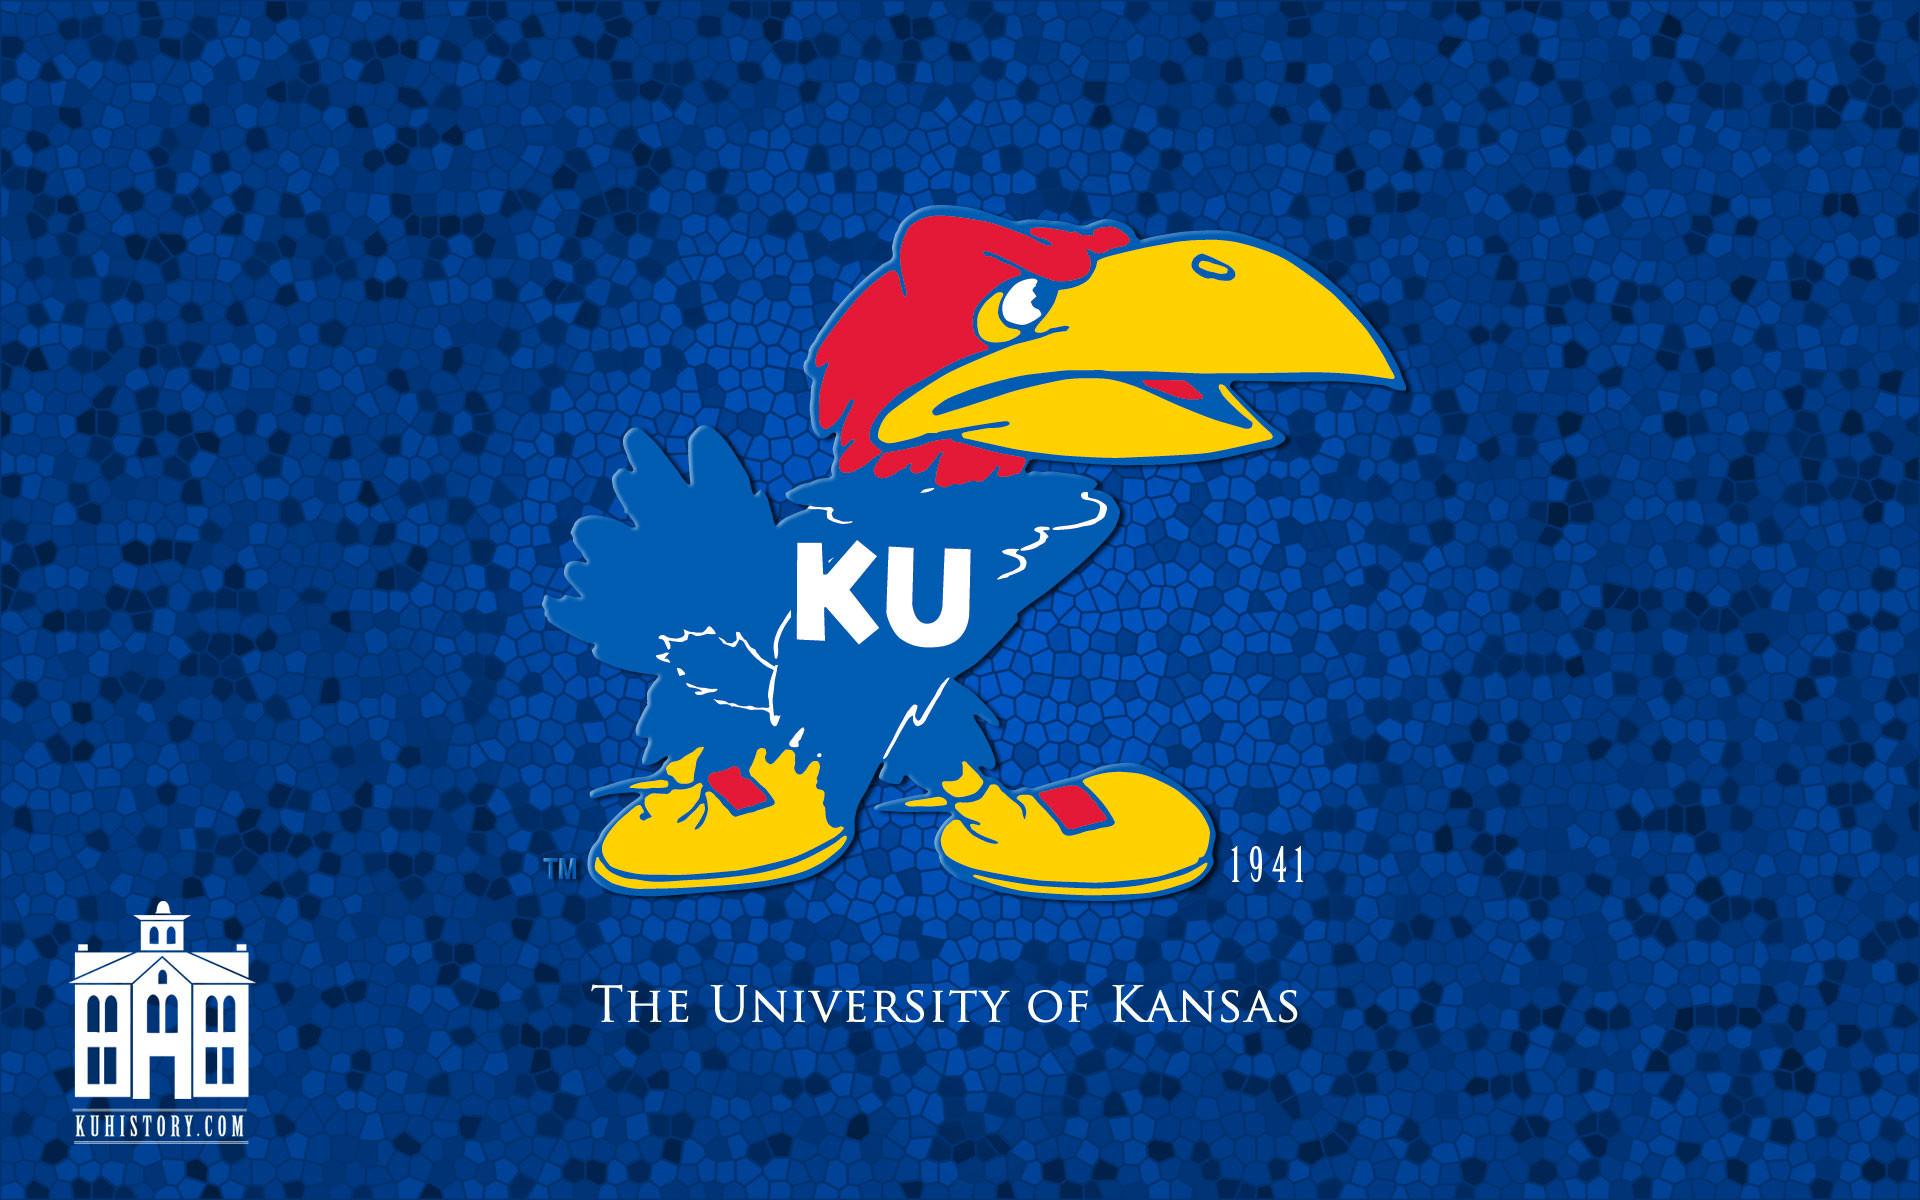 Kansas Jayhawks Wallpapers ·â' WallpaperTag